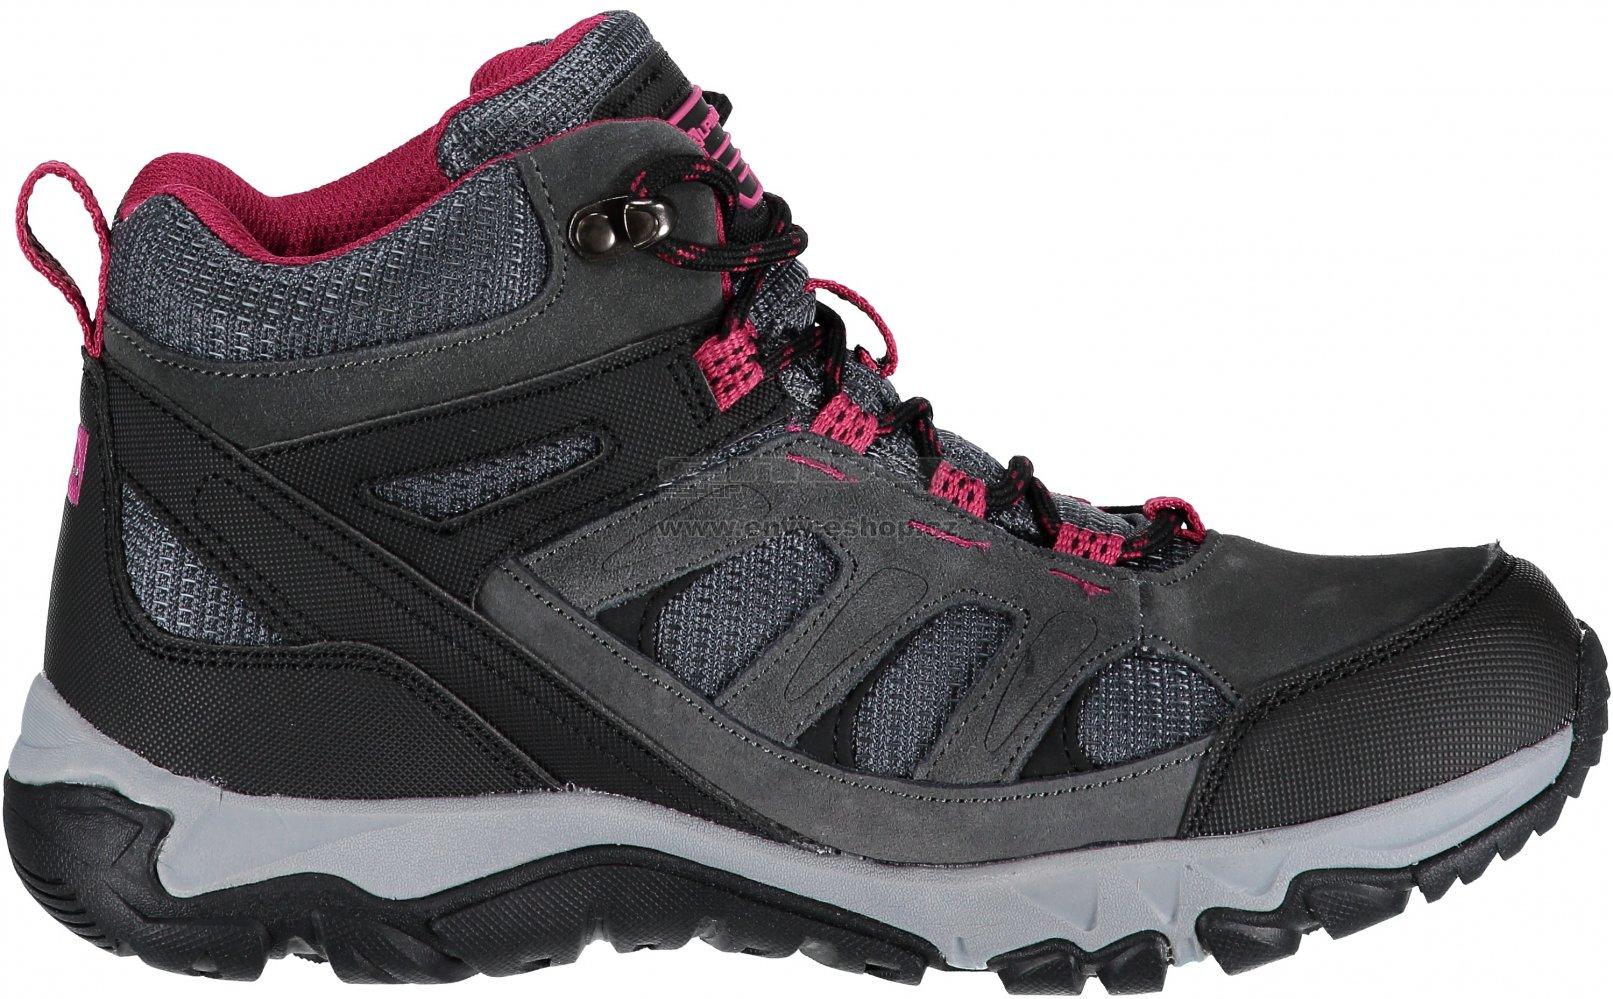 Dámská turistická obuv ALPINE PRO ARNETTA LBTM176 TMAVĚ ŠEDÁ ... 8defacac490